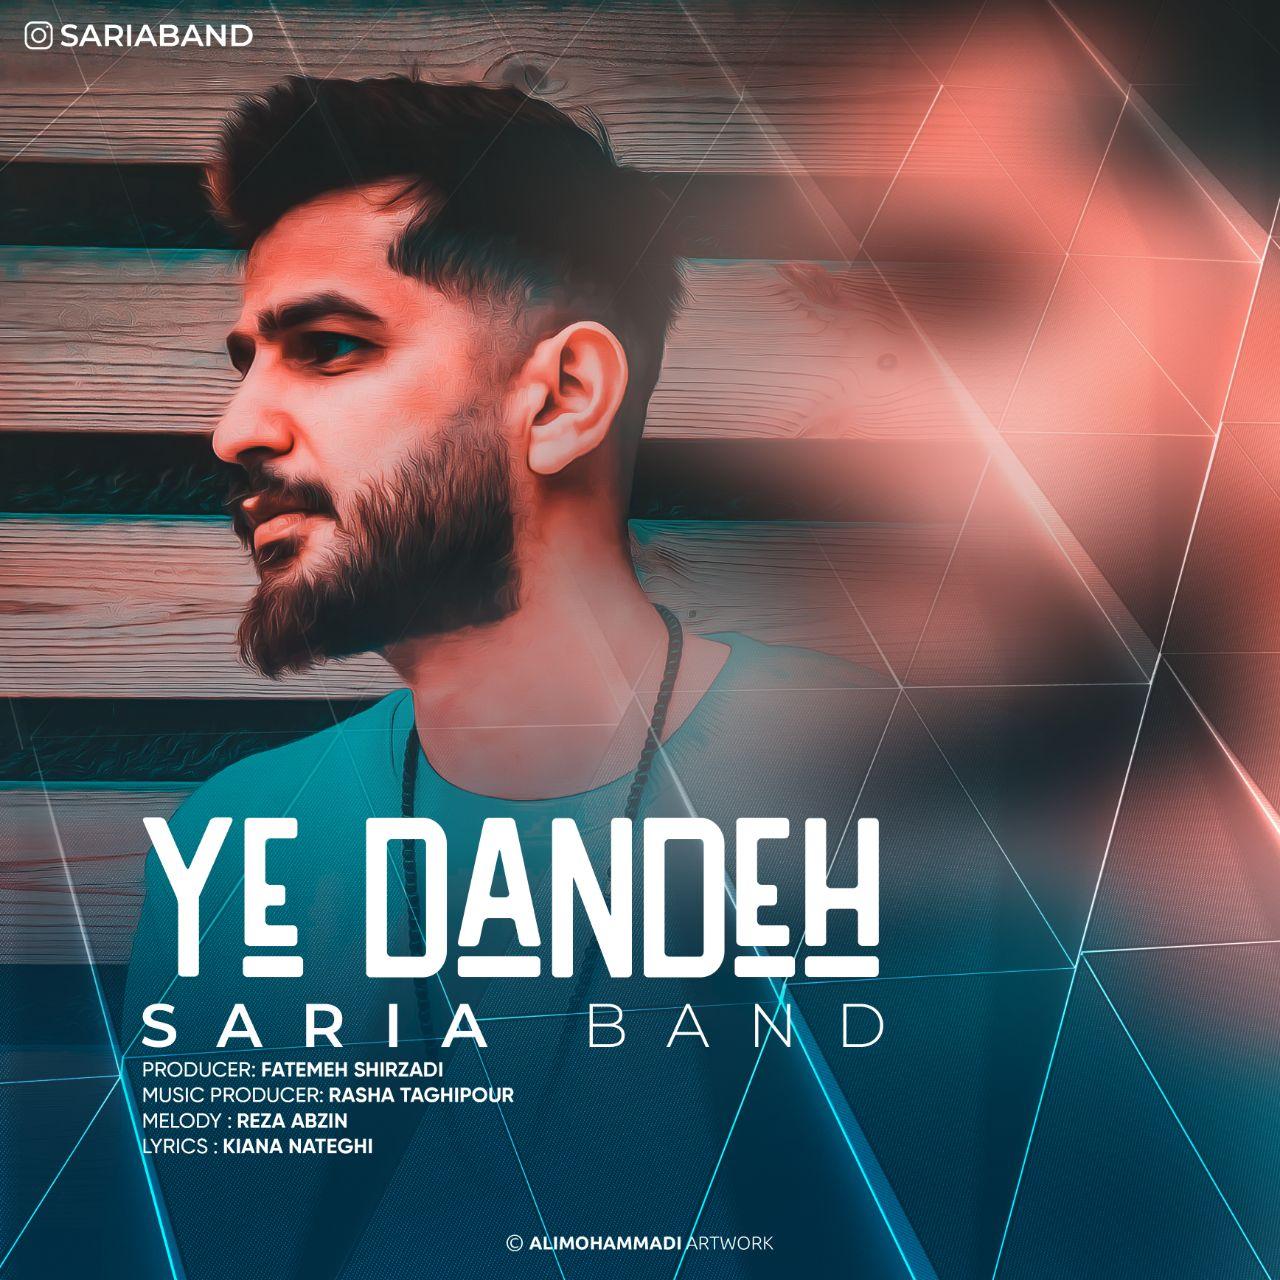 Saria Band – Ye Dandeh